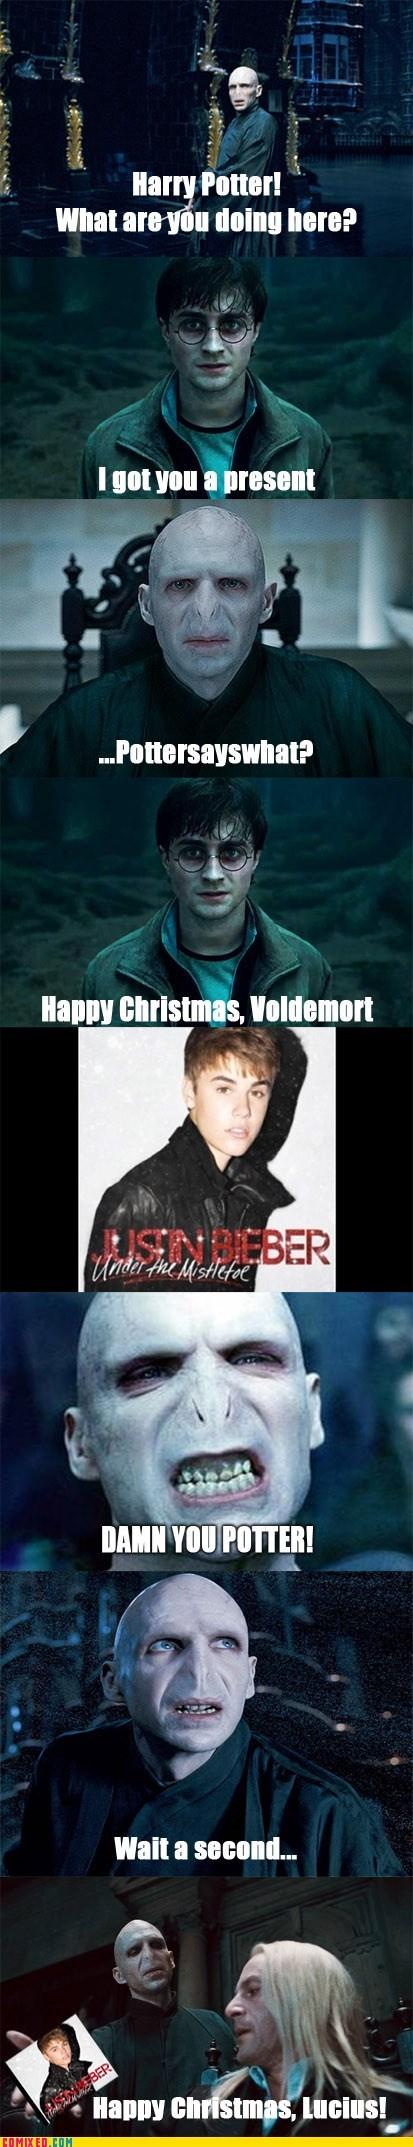 Harry Potter justin beiber loathing regift voldemort - 5539356160